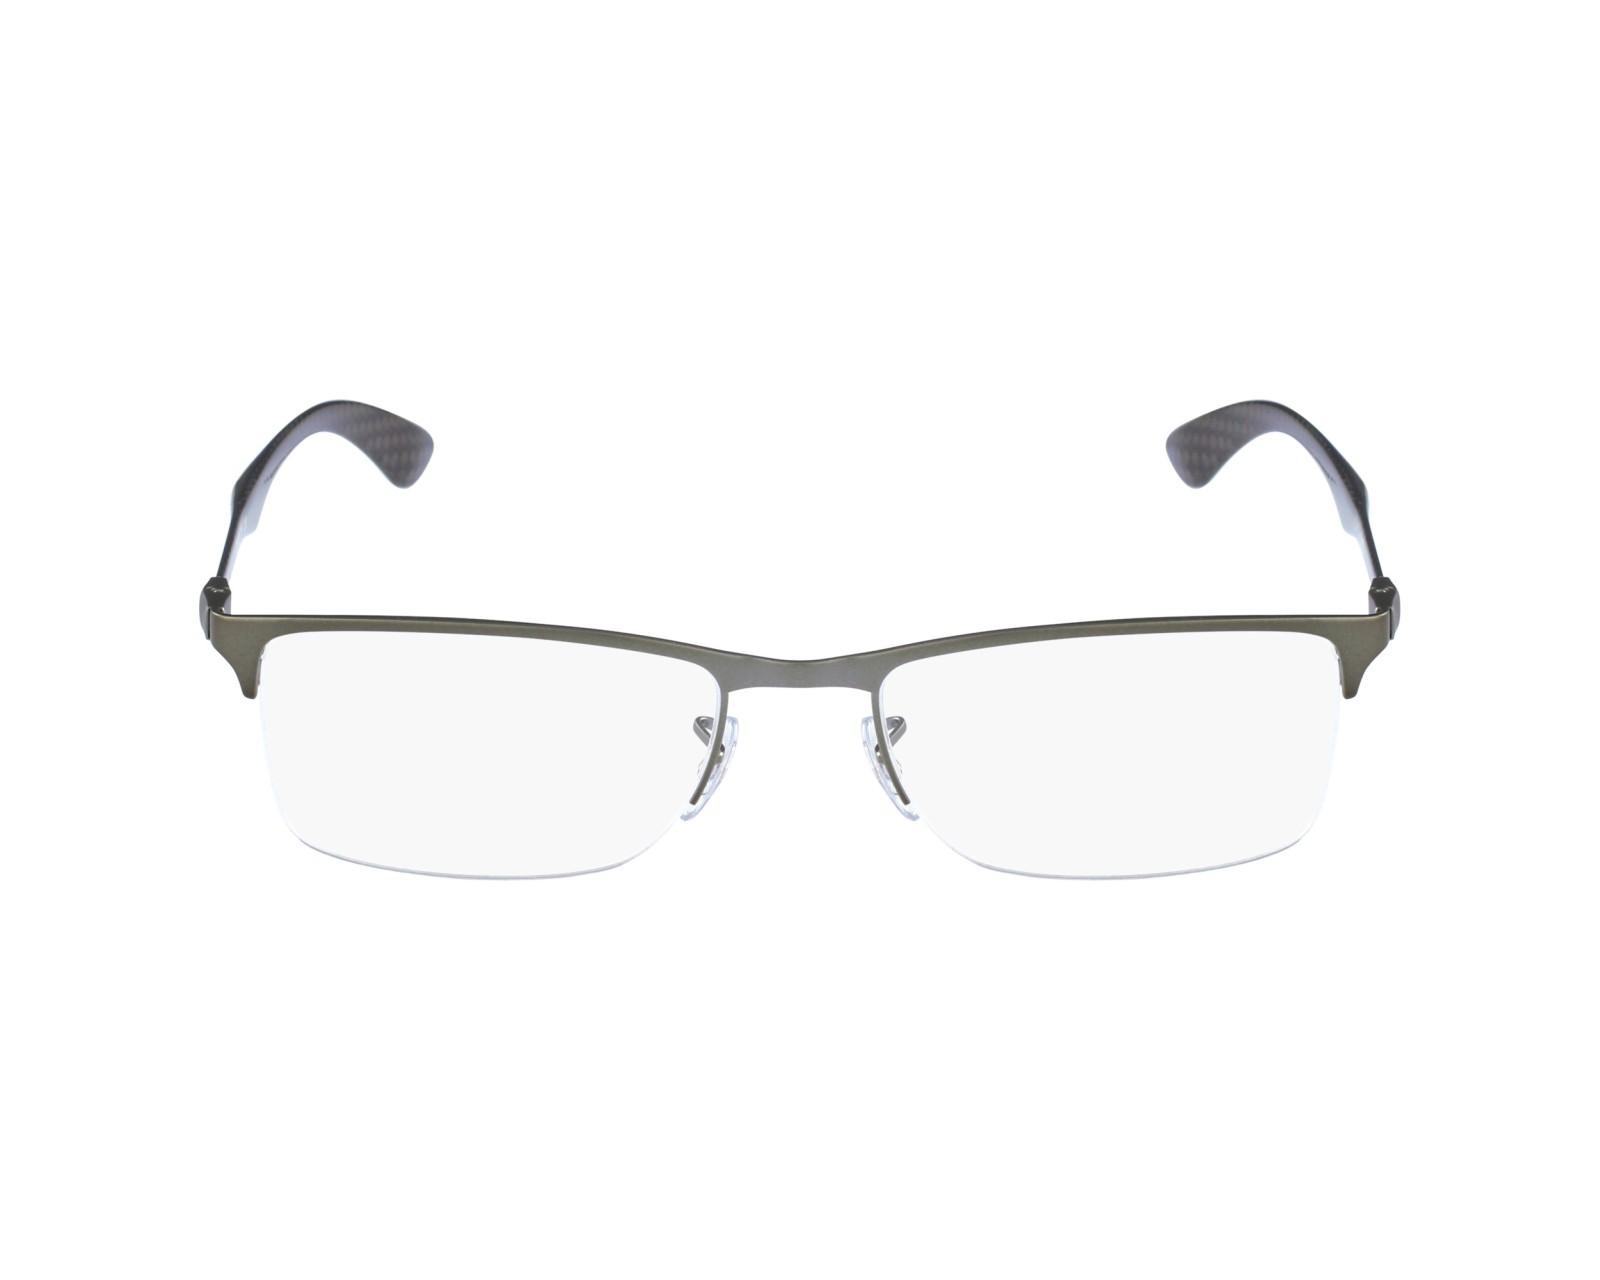 ec7d79c327 ... Free Shipping - Ottica SM Ray-Ban Eyeglasses RX-8413 2620 Silver